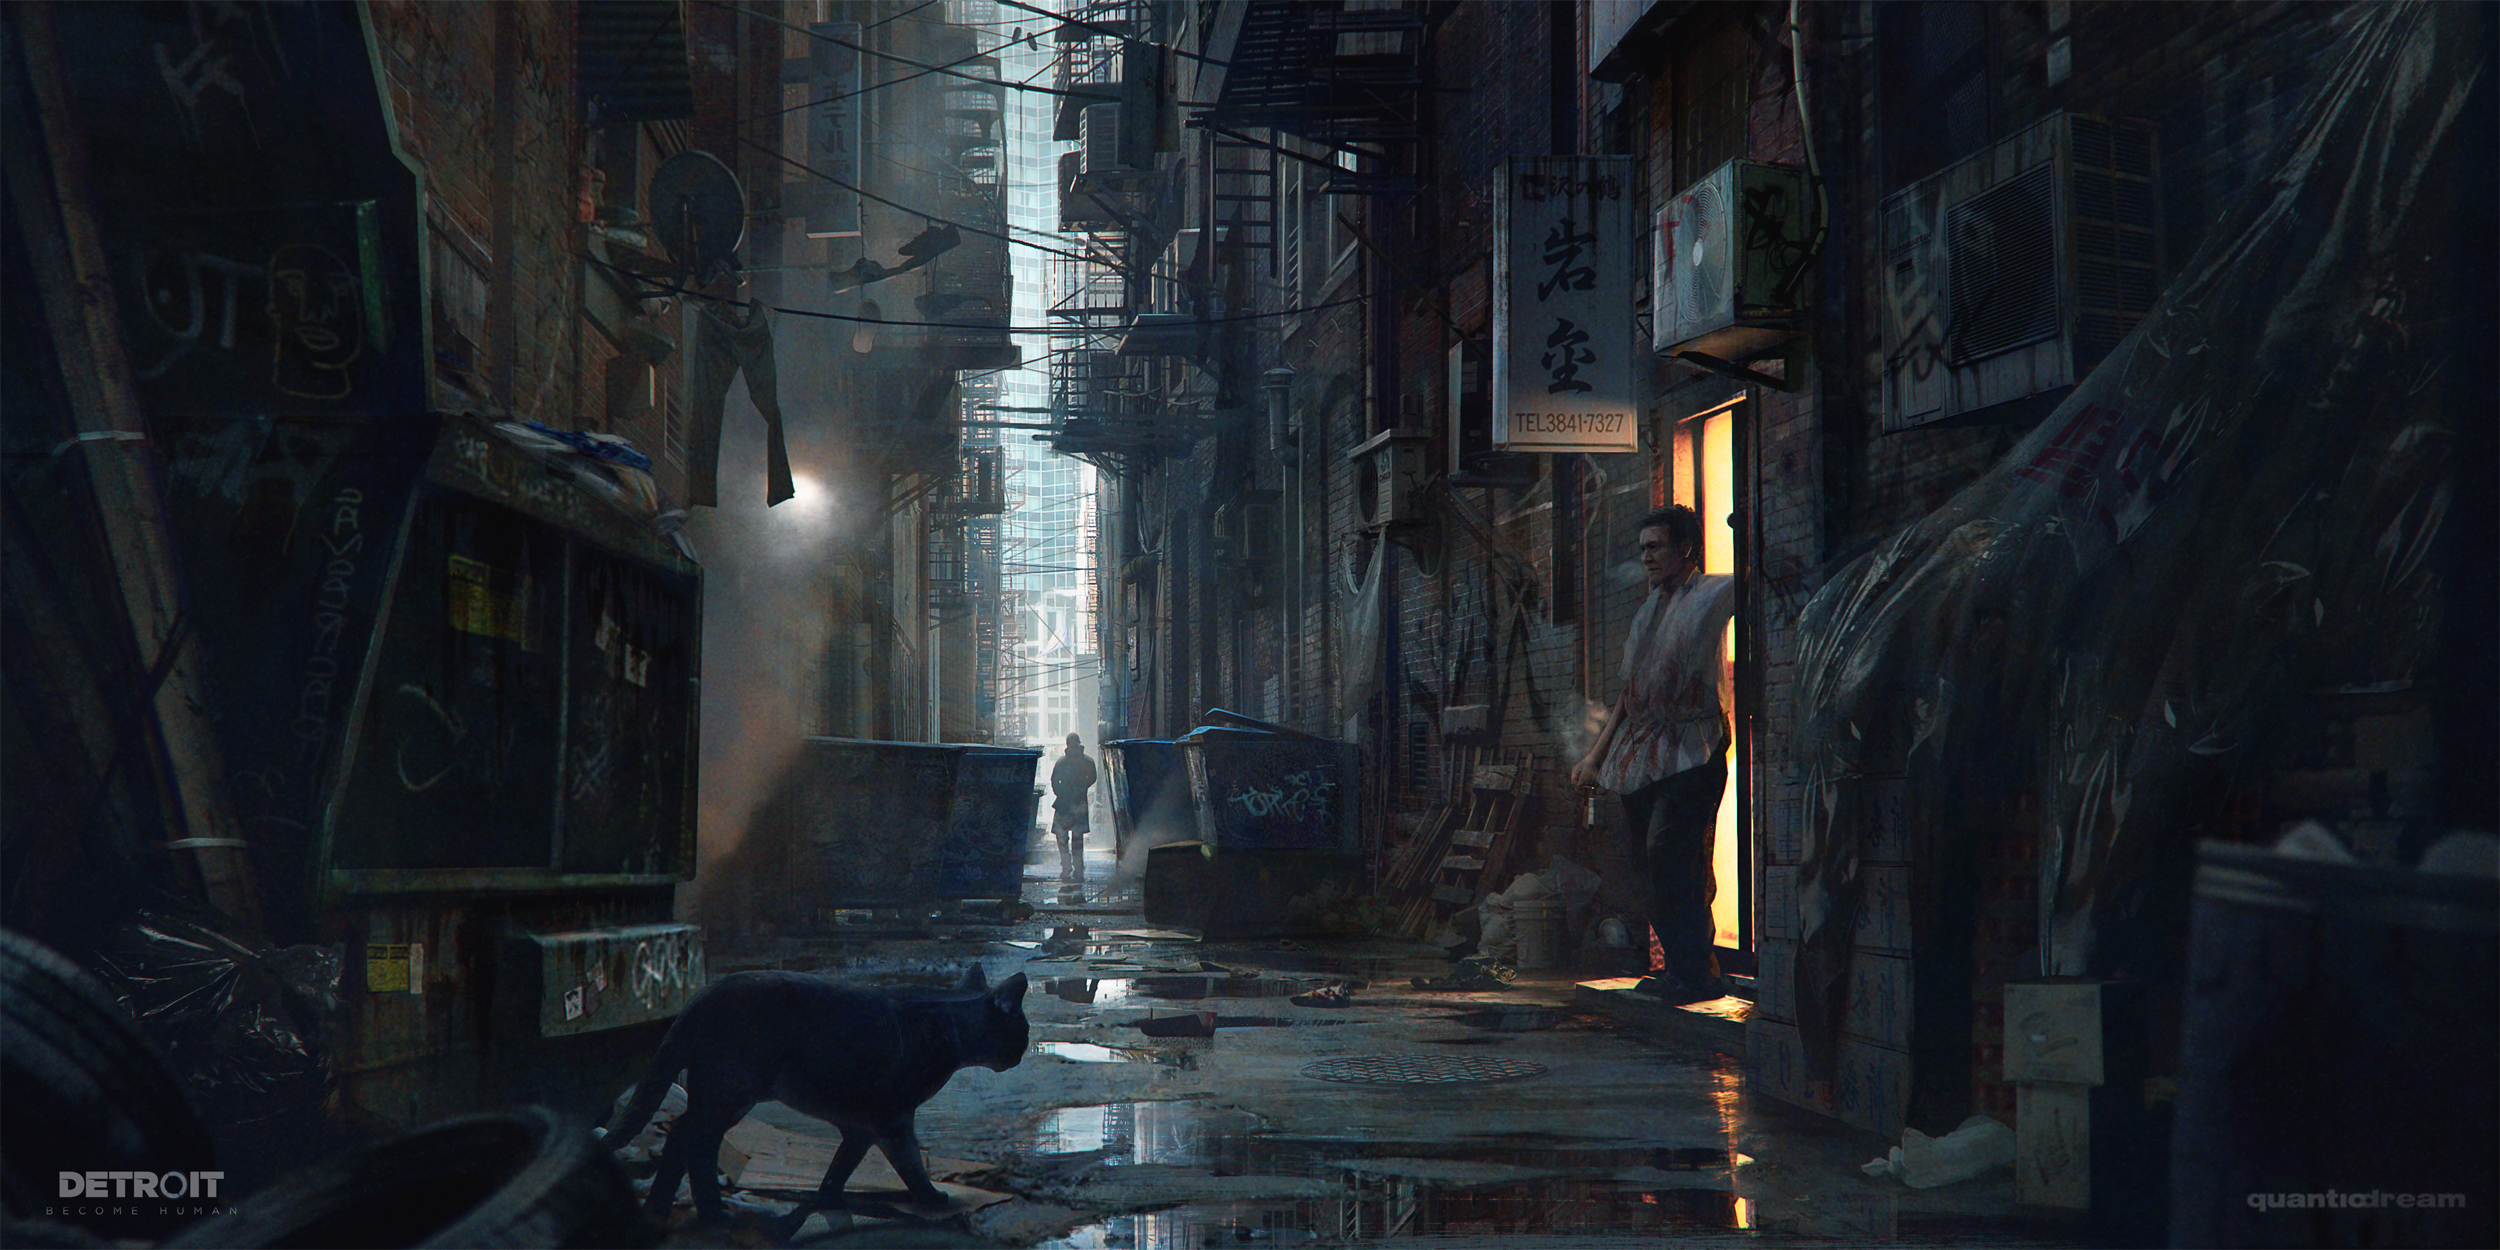 Detroit Become Human Hd Wallpaper: Alleyway Detroit Become Human, HD Games, 4k Wallpapers